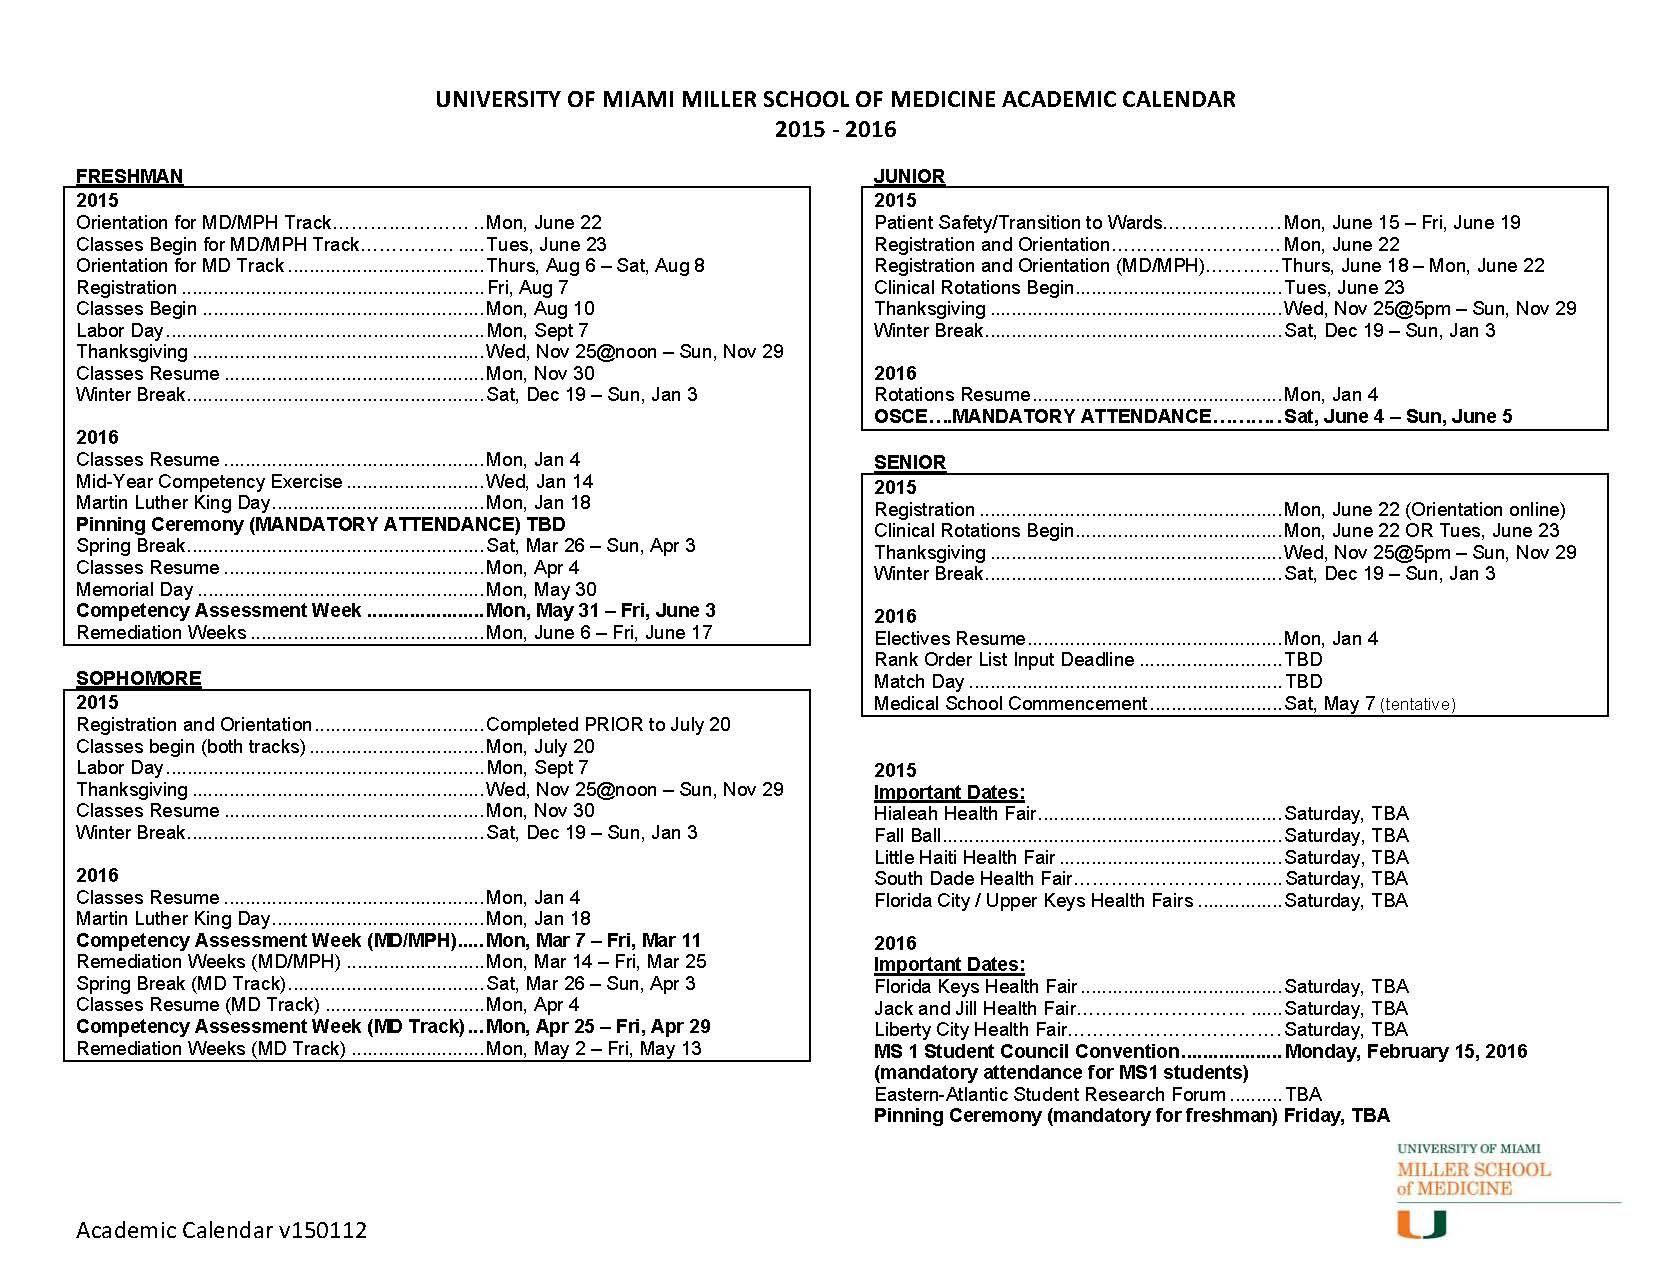 University Of Miami Academic Calendar With Holidays Https Www Youcalendars Com University Of Miami Aca Academic Calendar School Calendar University Of Miami